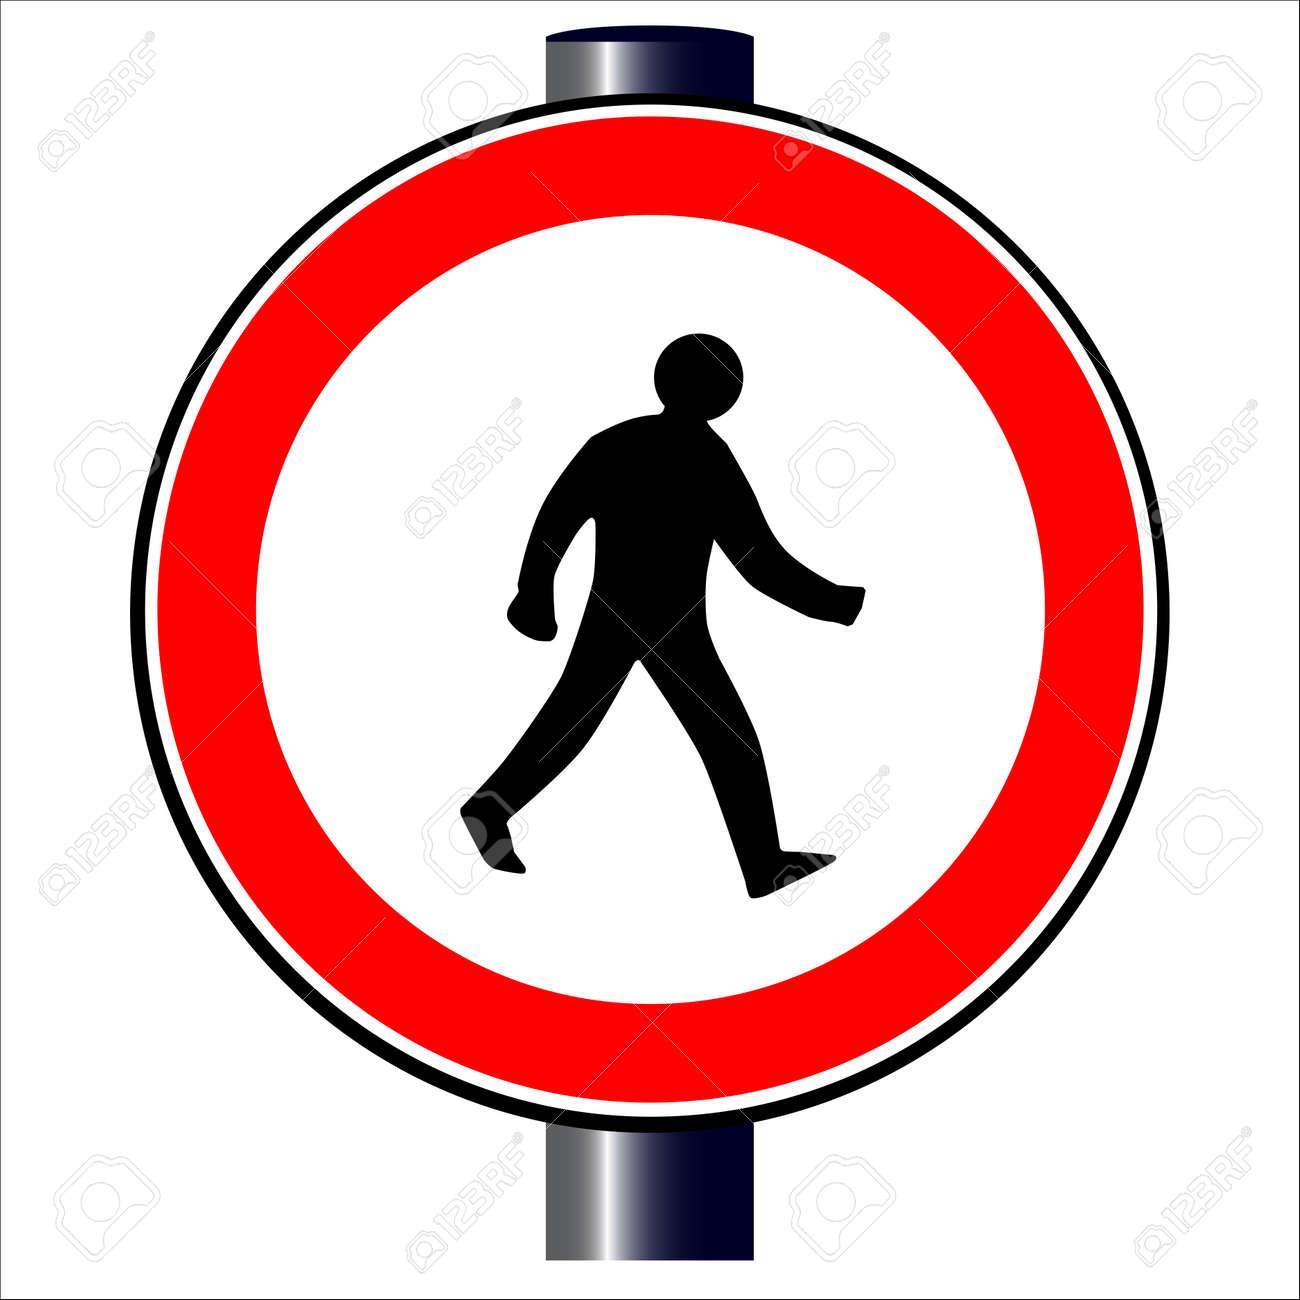 Walking man traffic sign Stock Vector - 20387980